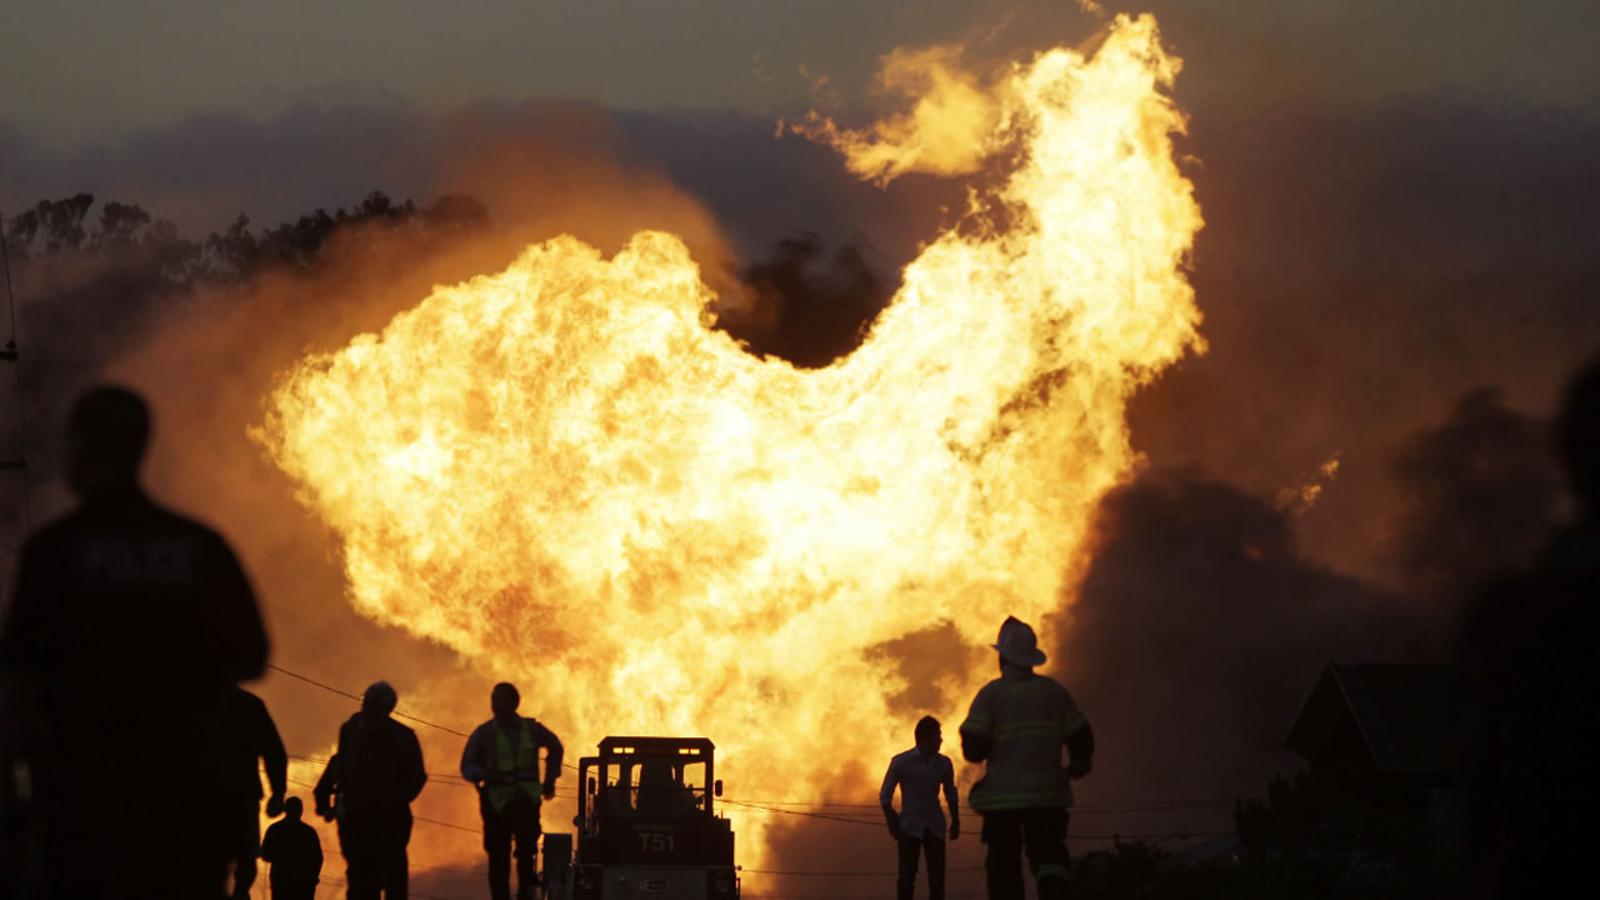 Judge sentences PG&E to $3M fine, advertising of conviction in San Bruno  fire